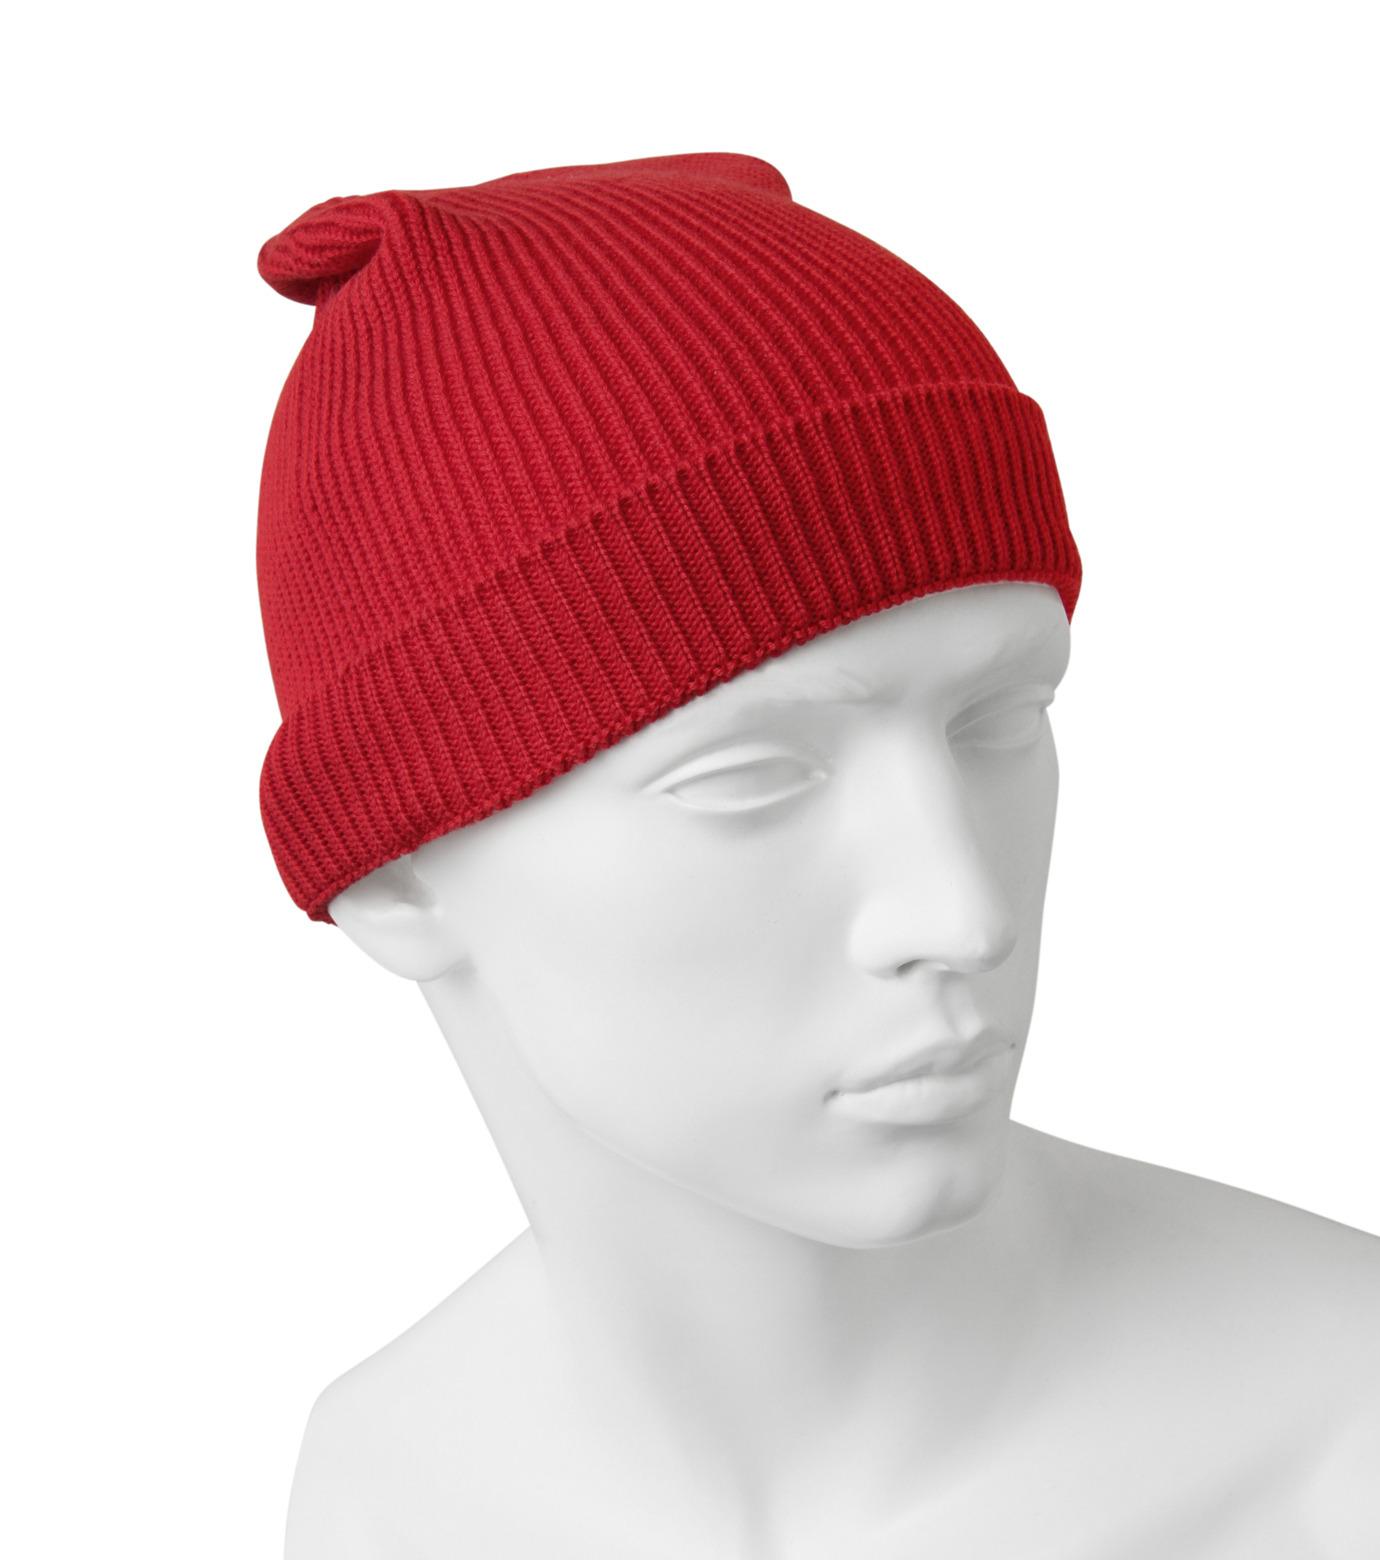 Ami(アミ)のKnit Cap-RED(アクセサリー/accessory)-E15K3102-62 拡大詳細画像2